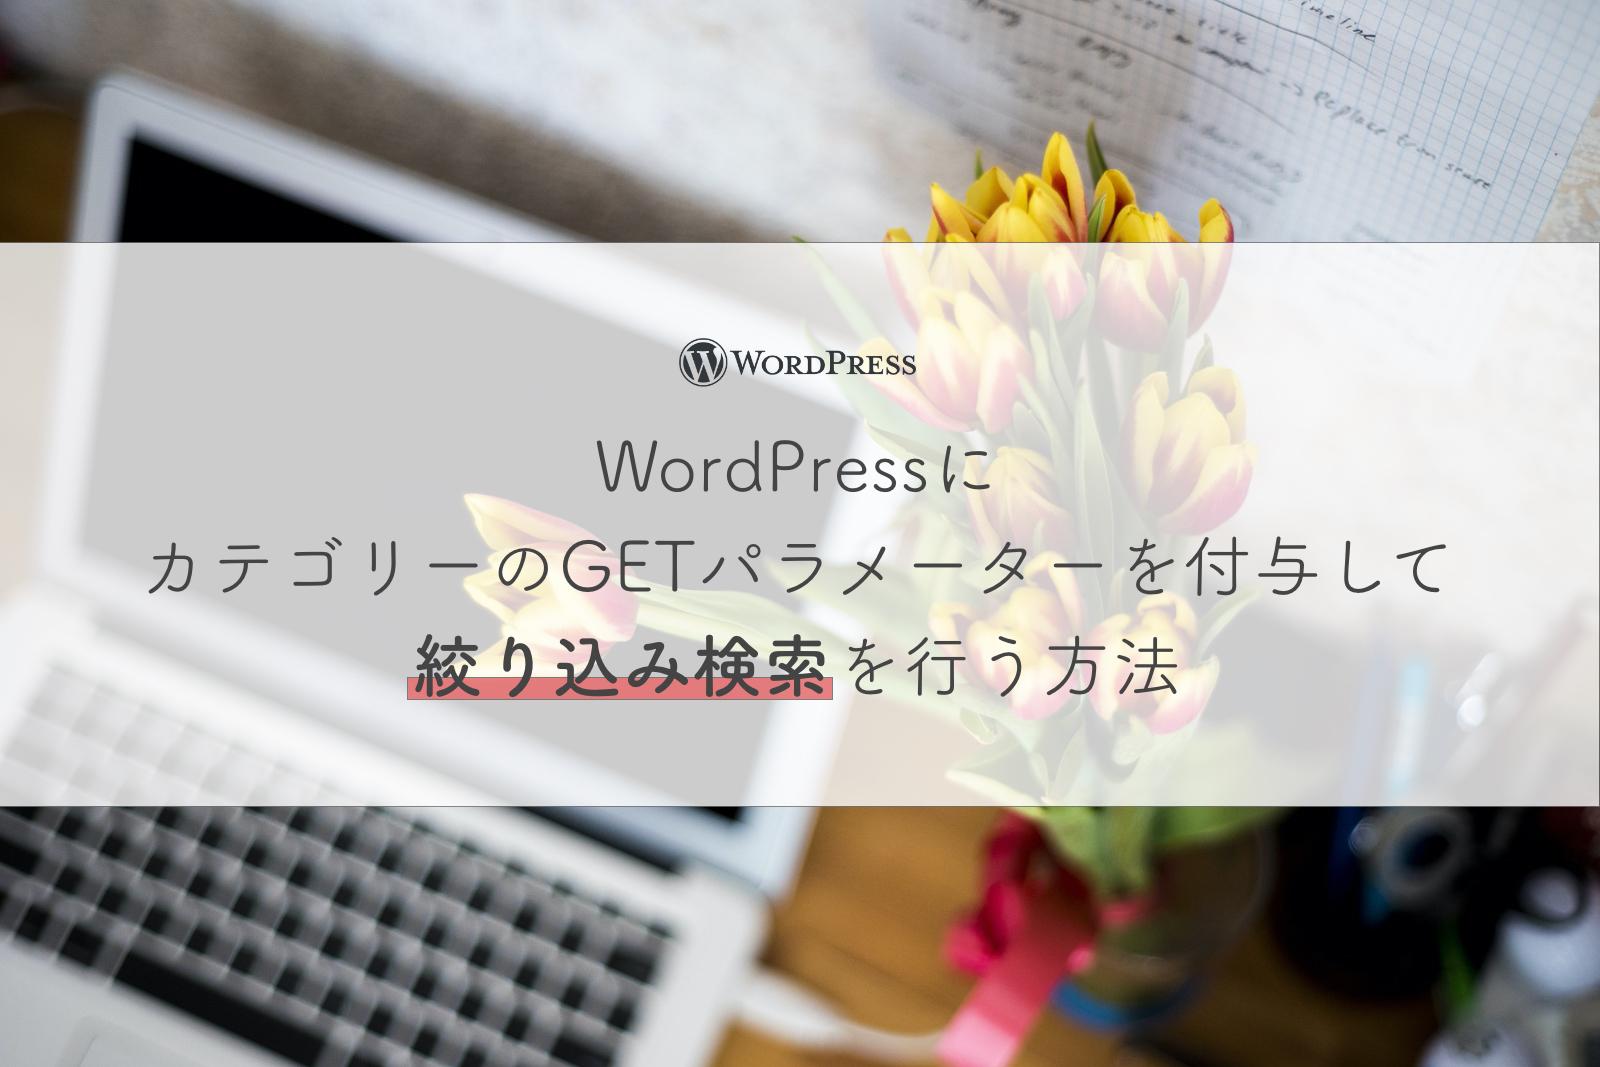 WordPressにカテゴリーのスラッグ名をGETパラメーターで付与して絞り込み検索を行う方法